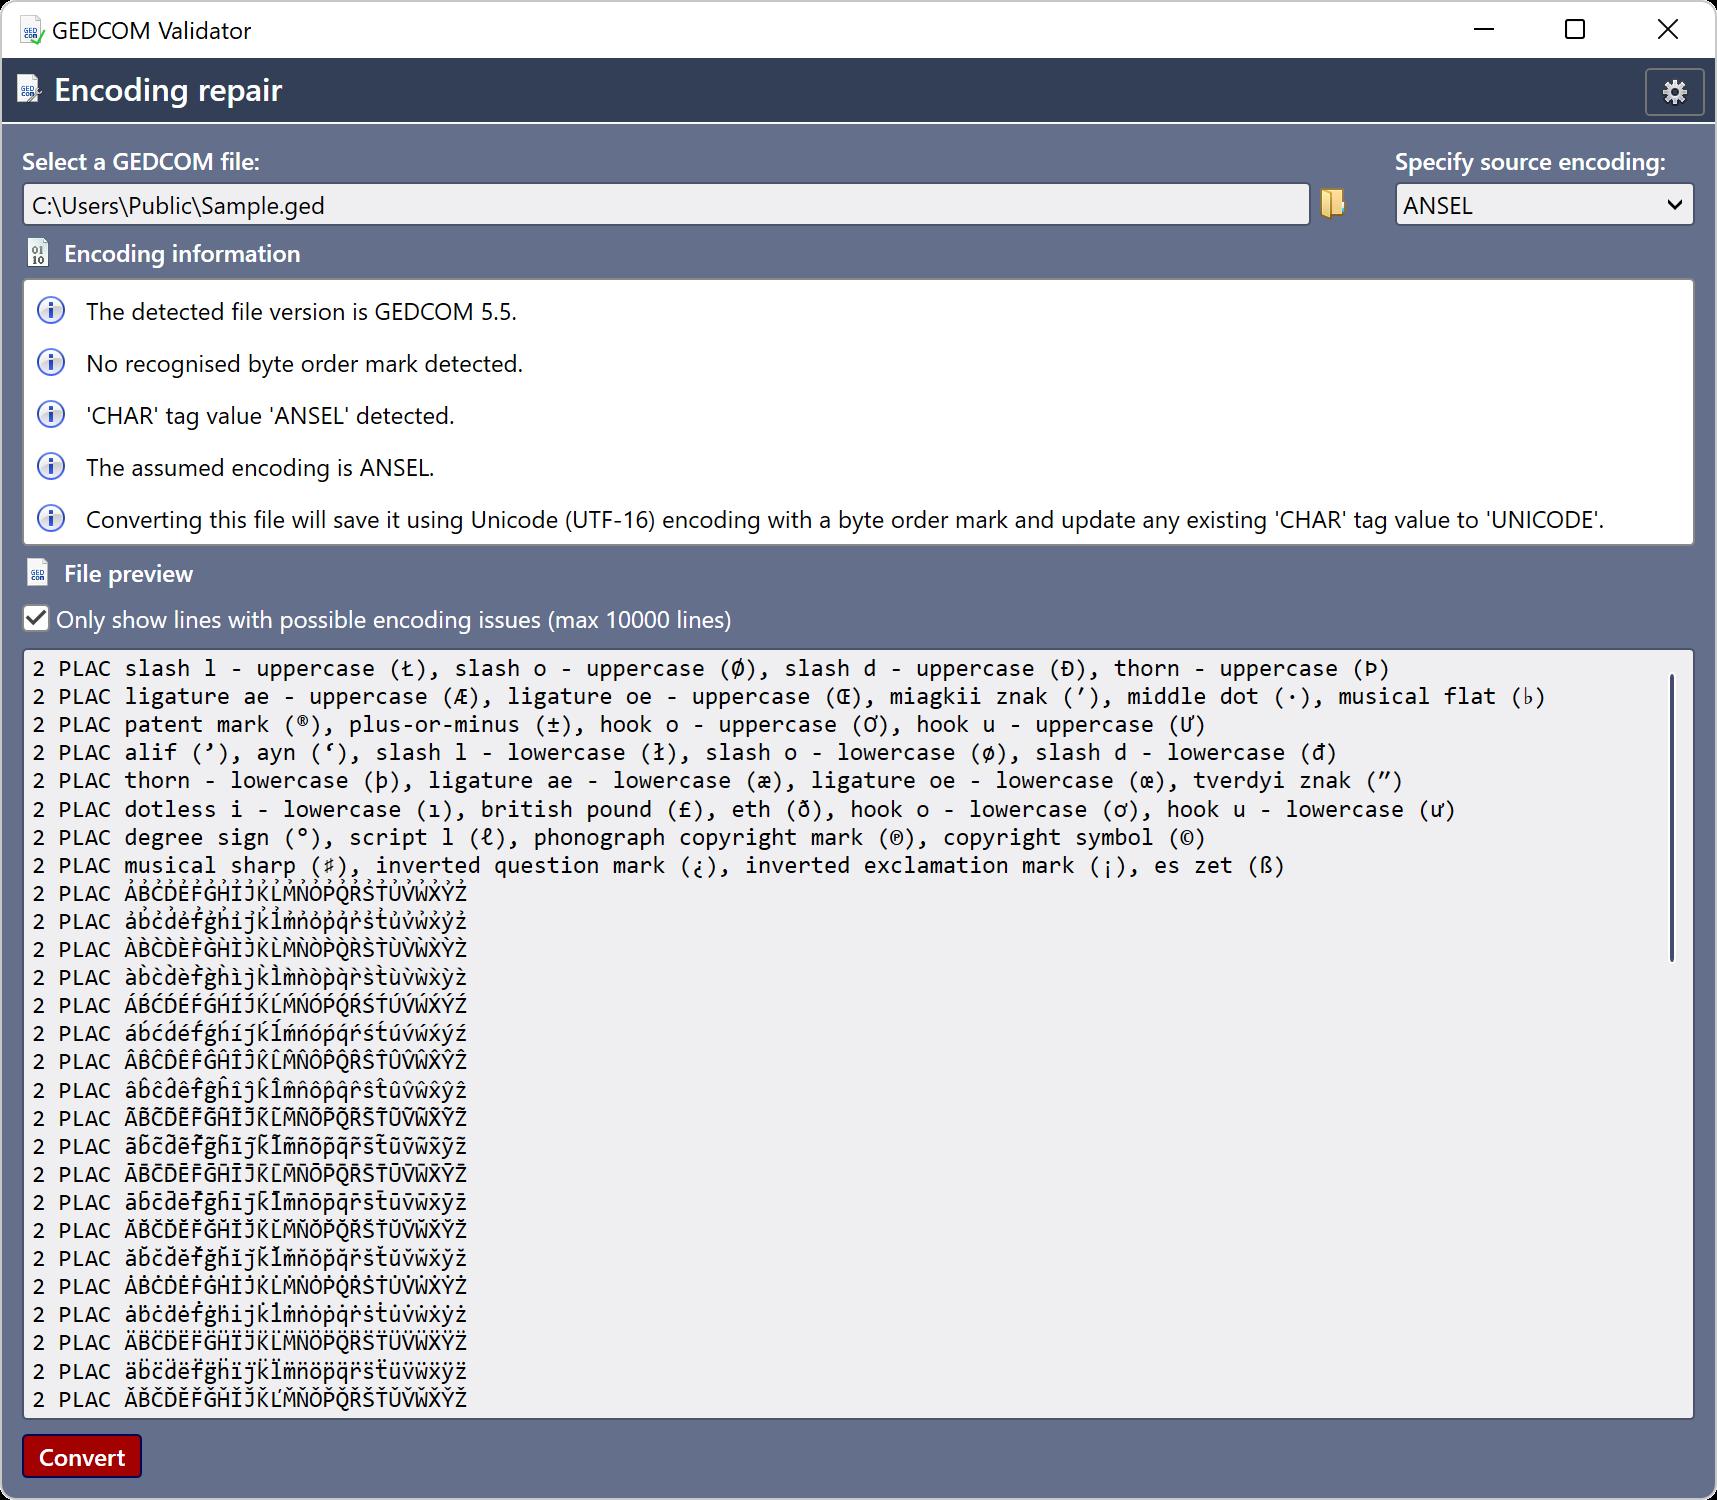 GEDCOM Validator screenshot